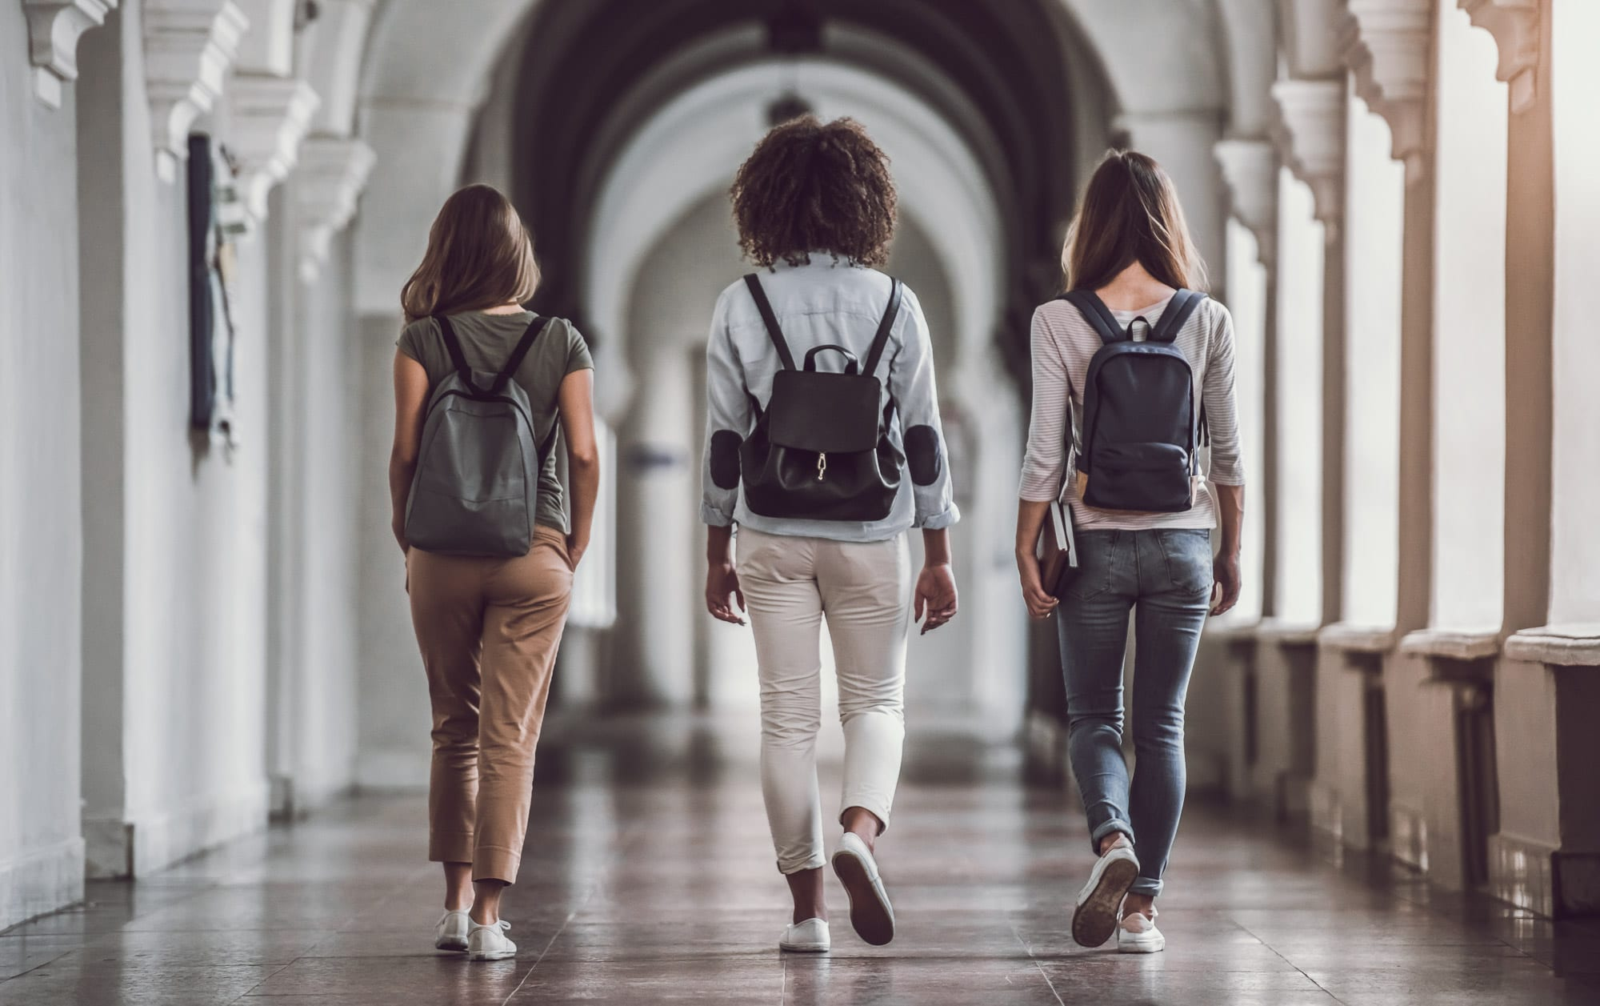 Women walking down a hall